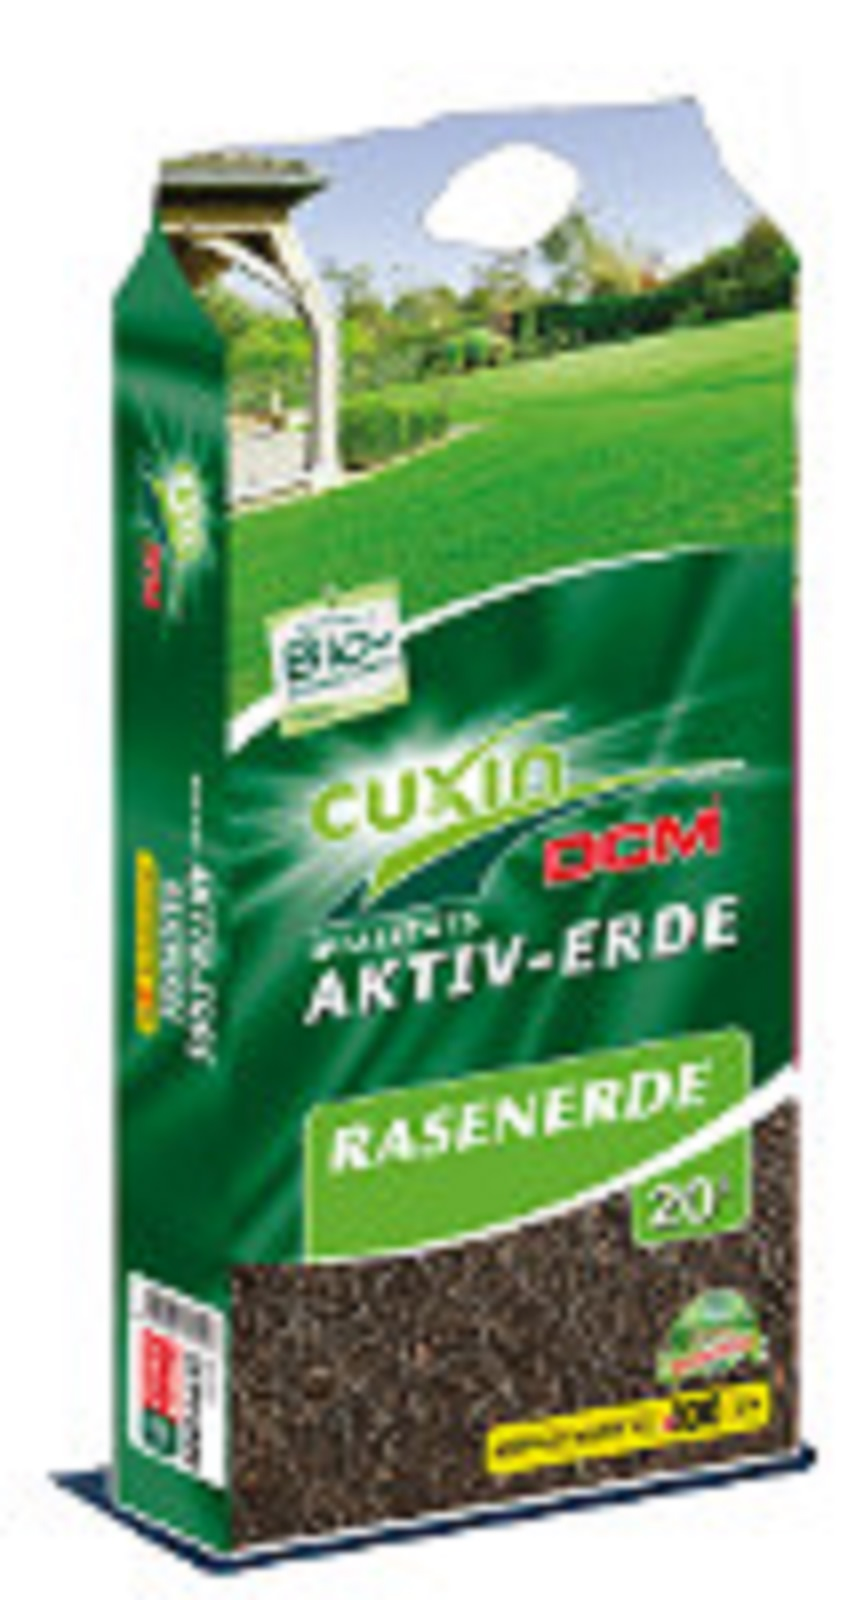 Cuxin DCM Aktiv Erde Rasenerde 20 Liter